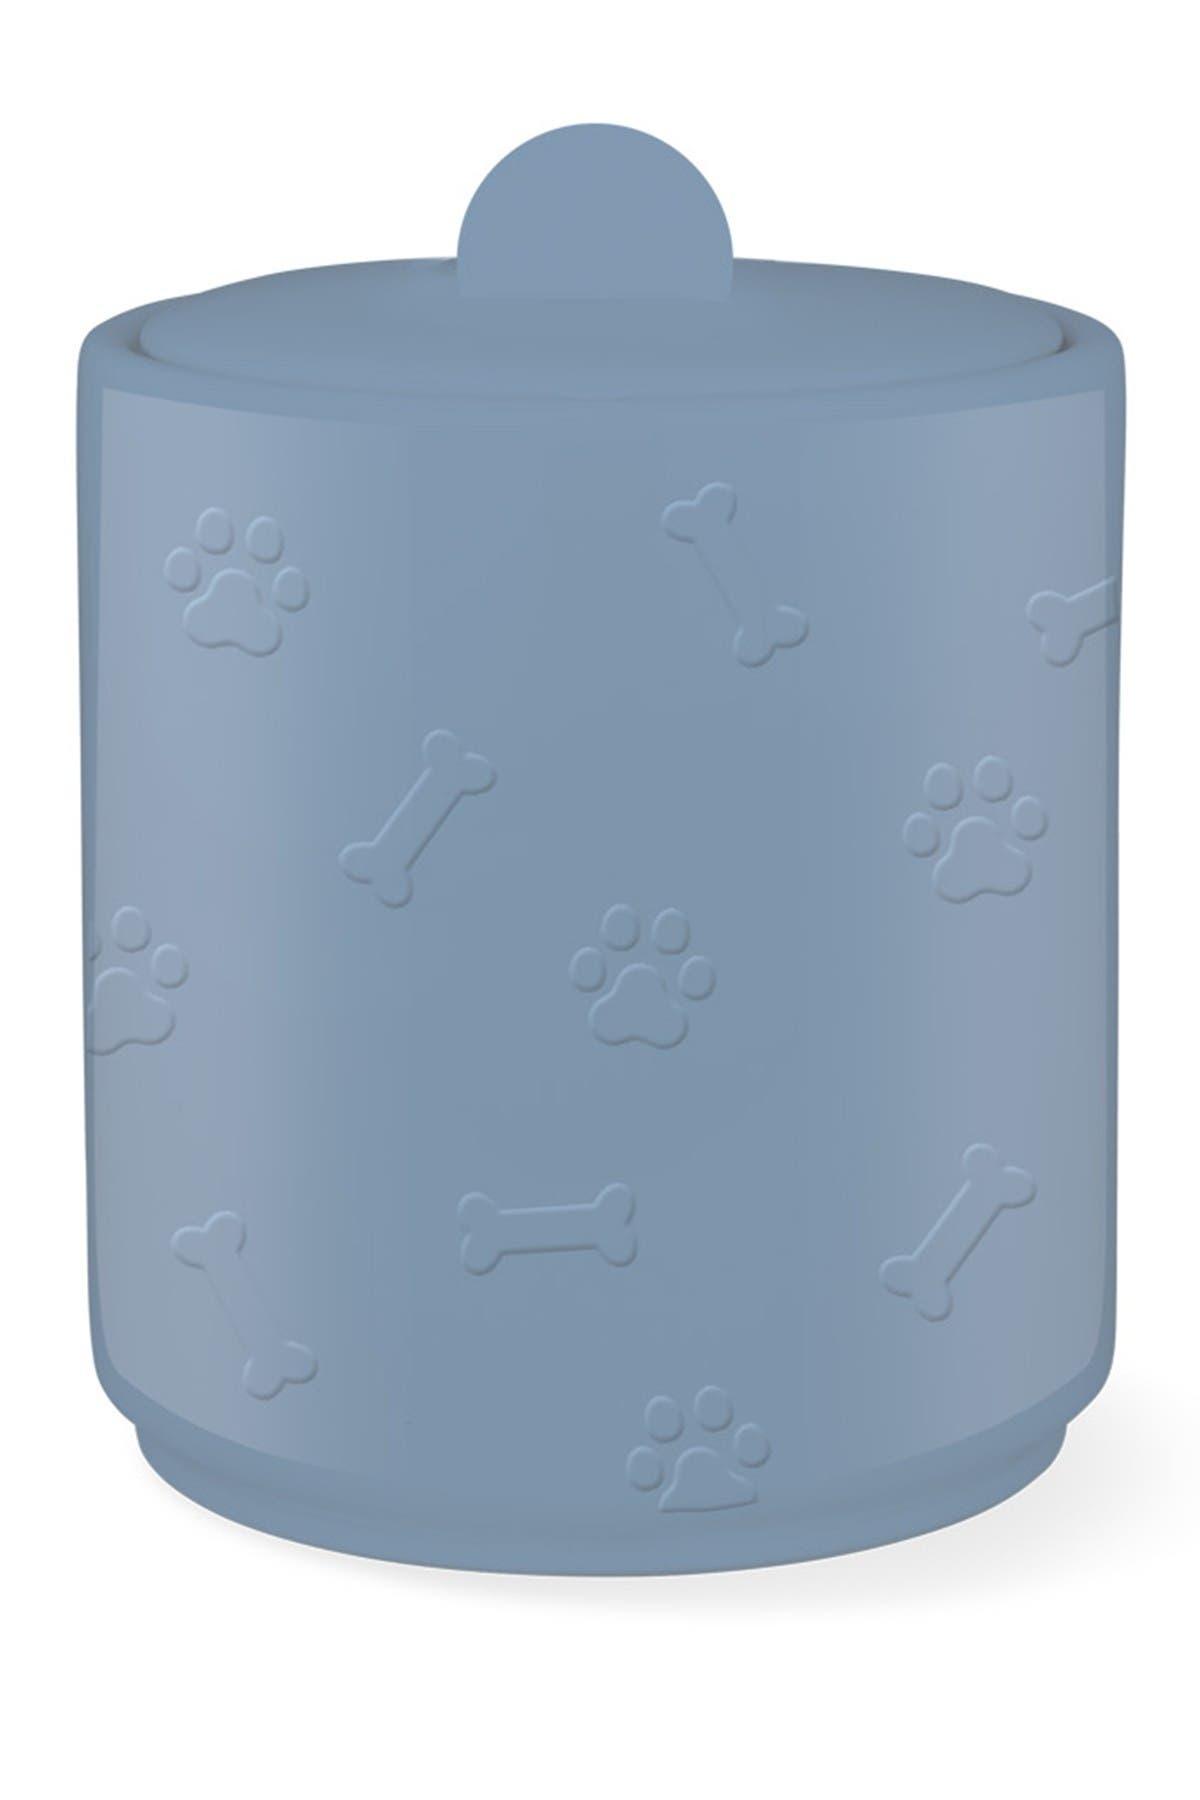 Image of Fringe Studio Blue Paw Bone Sculpted Treat Jar